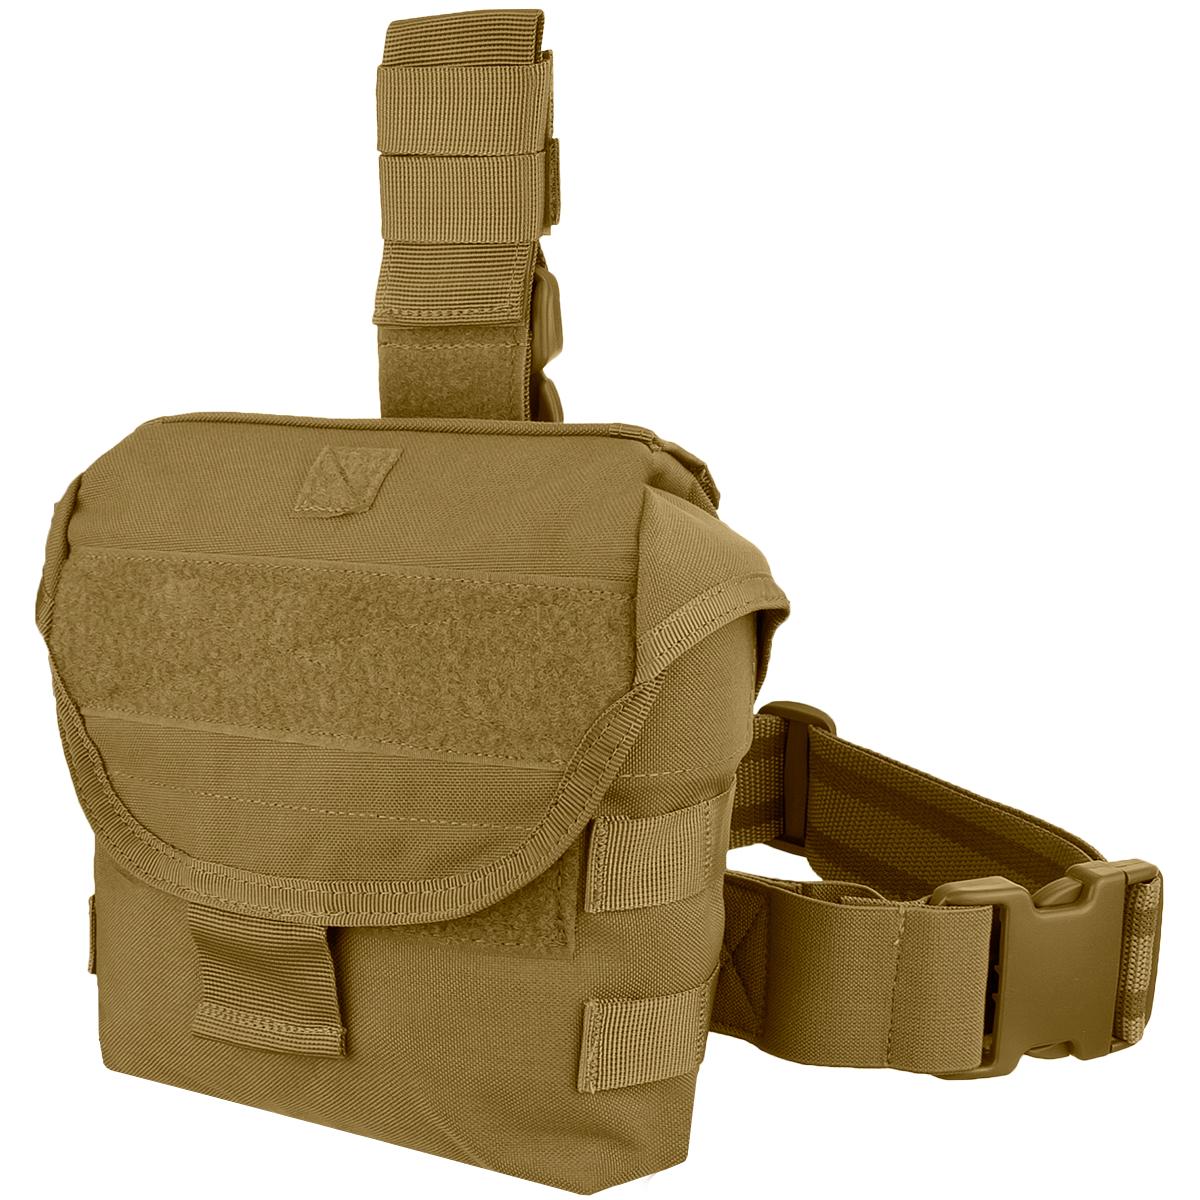 condor drop leg dump pouch coyote brown magazine pouches. Black Bedroom Furniture Sets. Home Design Ideas